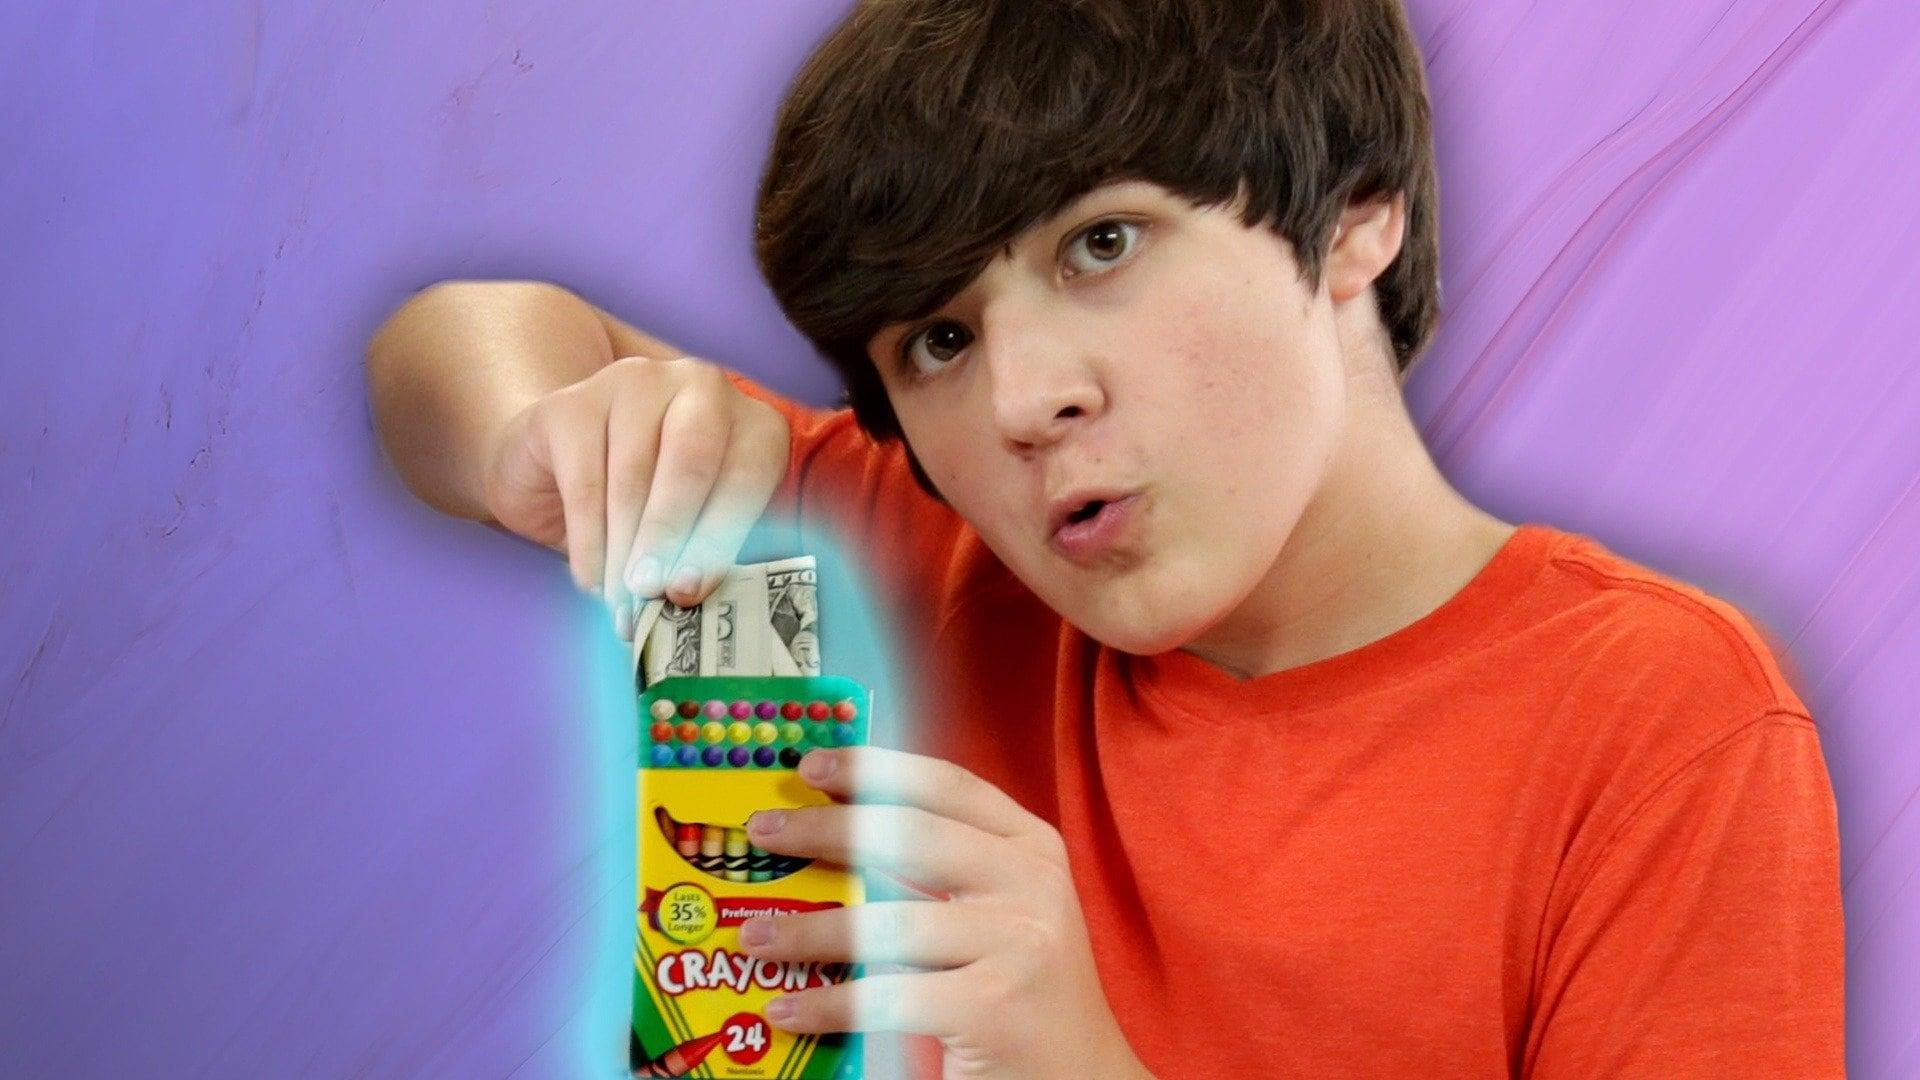 Magic Crayon Box Trick